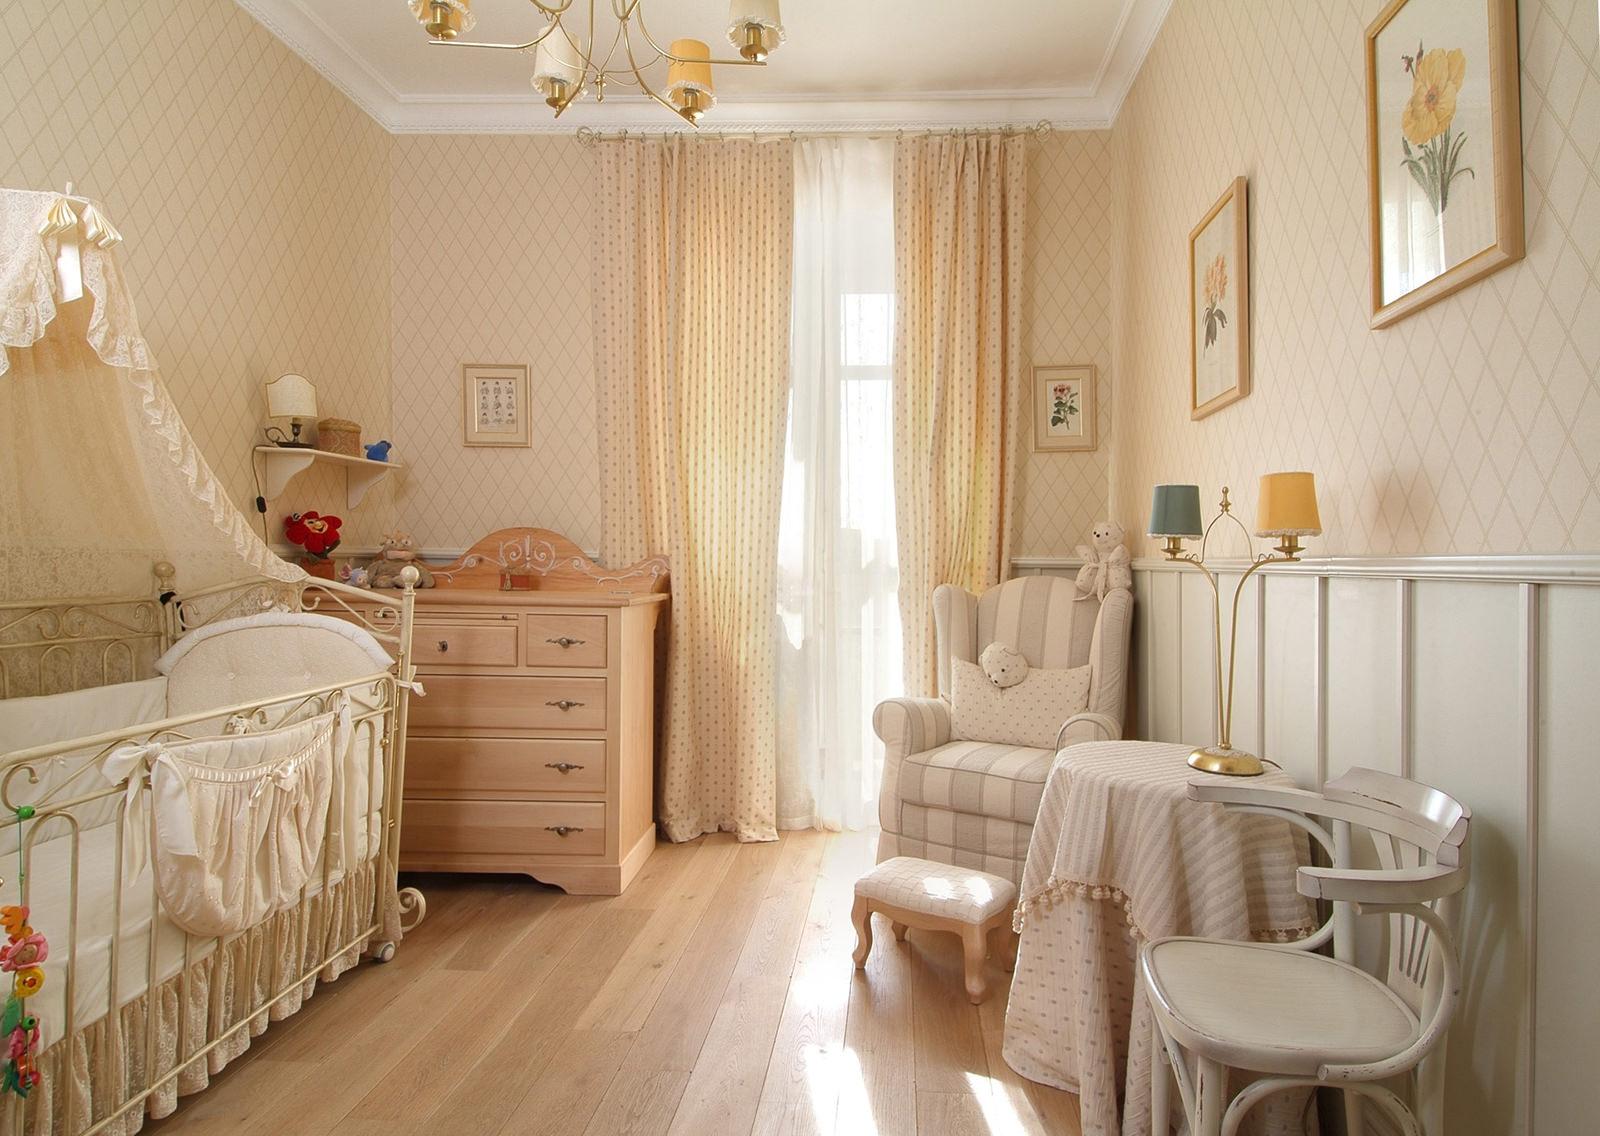 Детская комната в стиле прованс бежевая